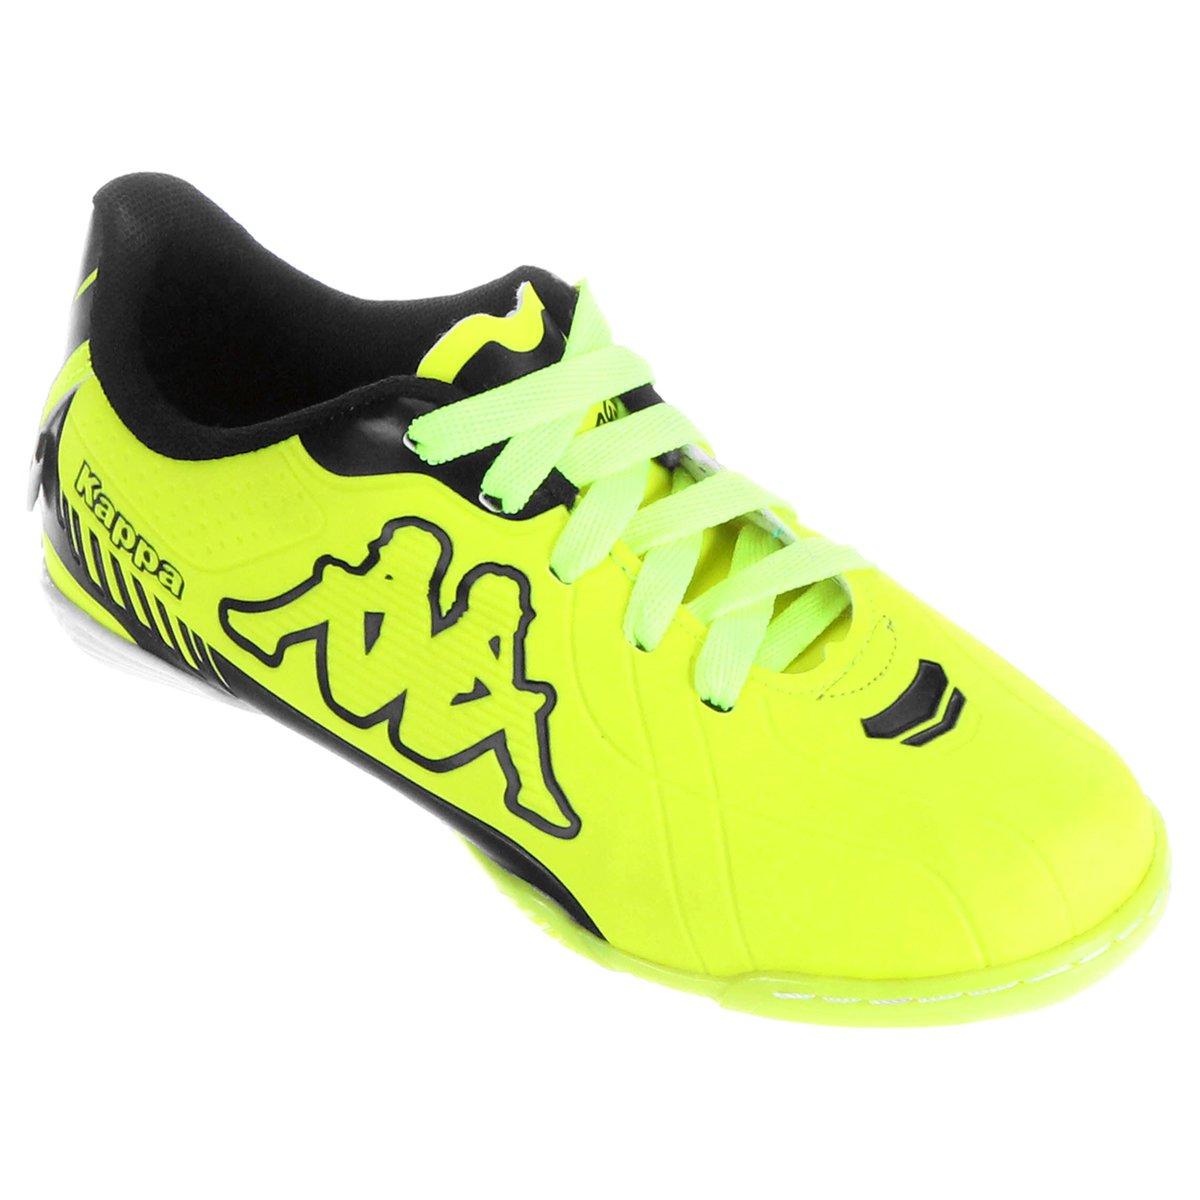 Chuteira Kappa Torino Futsal Infantil - Compre Agora   Netshoes 1469aa60fe